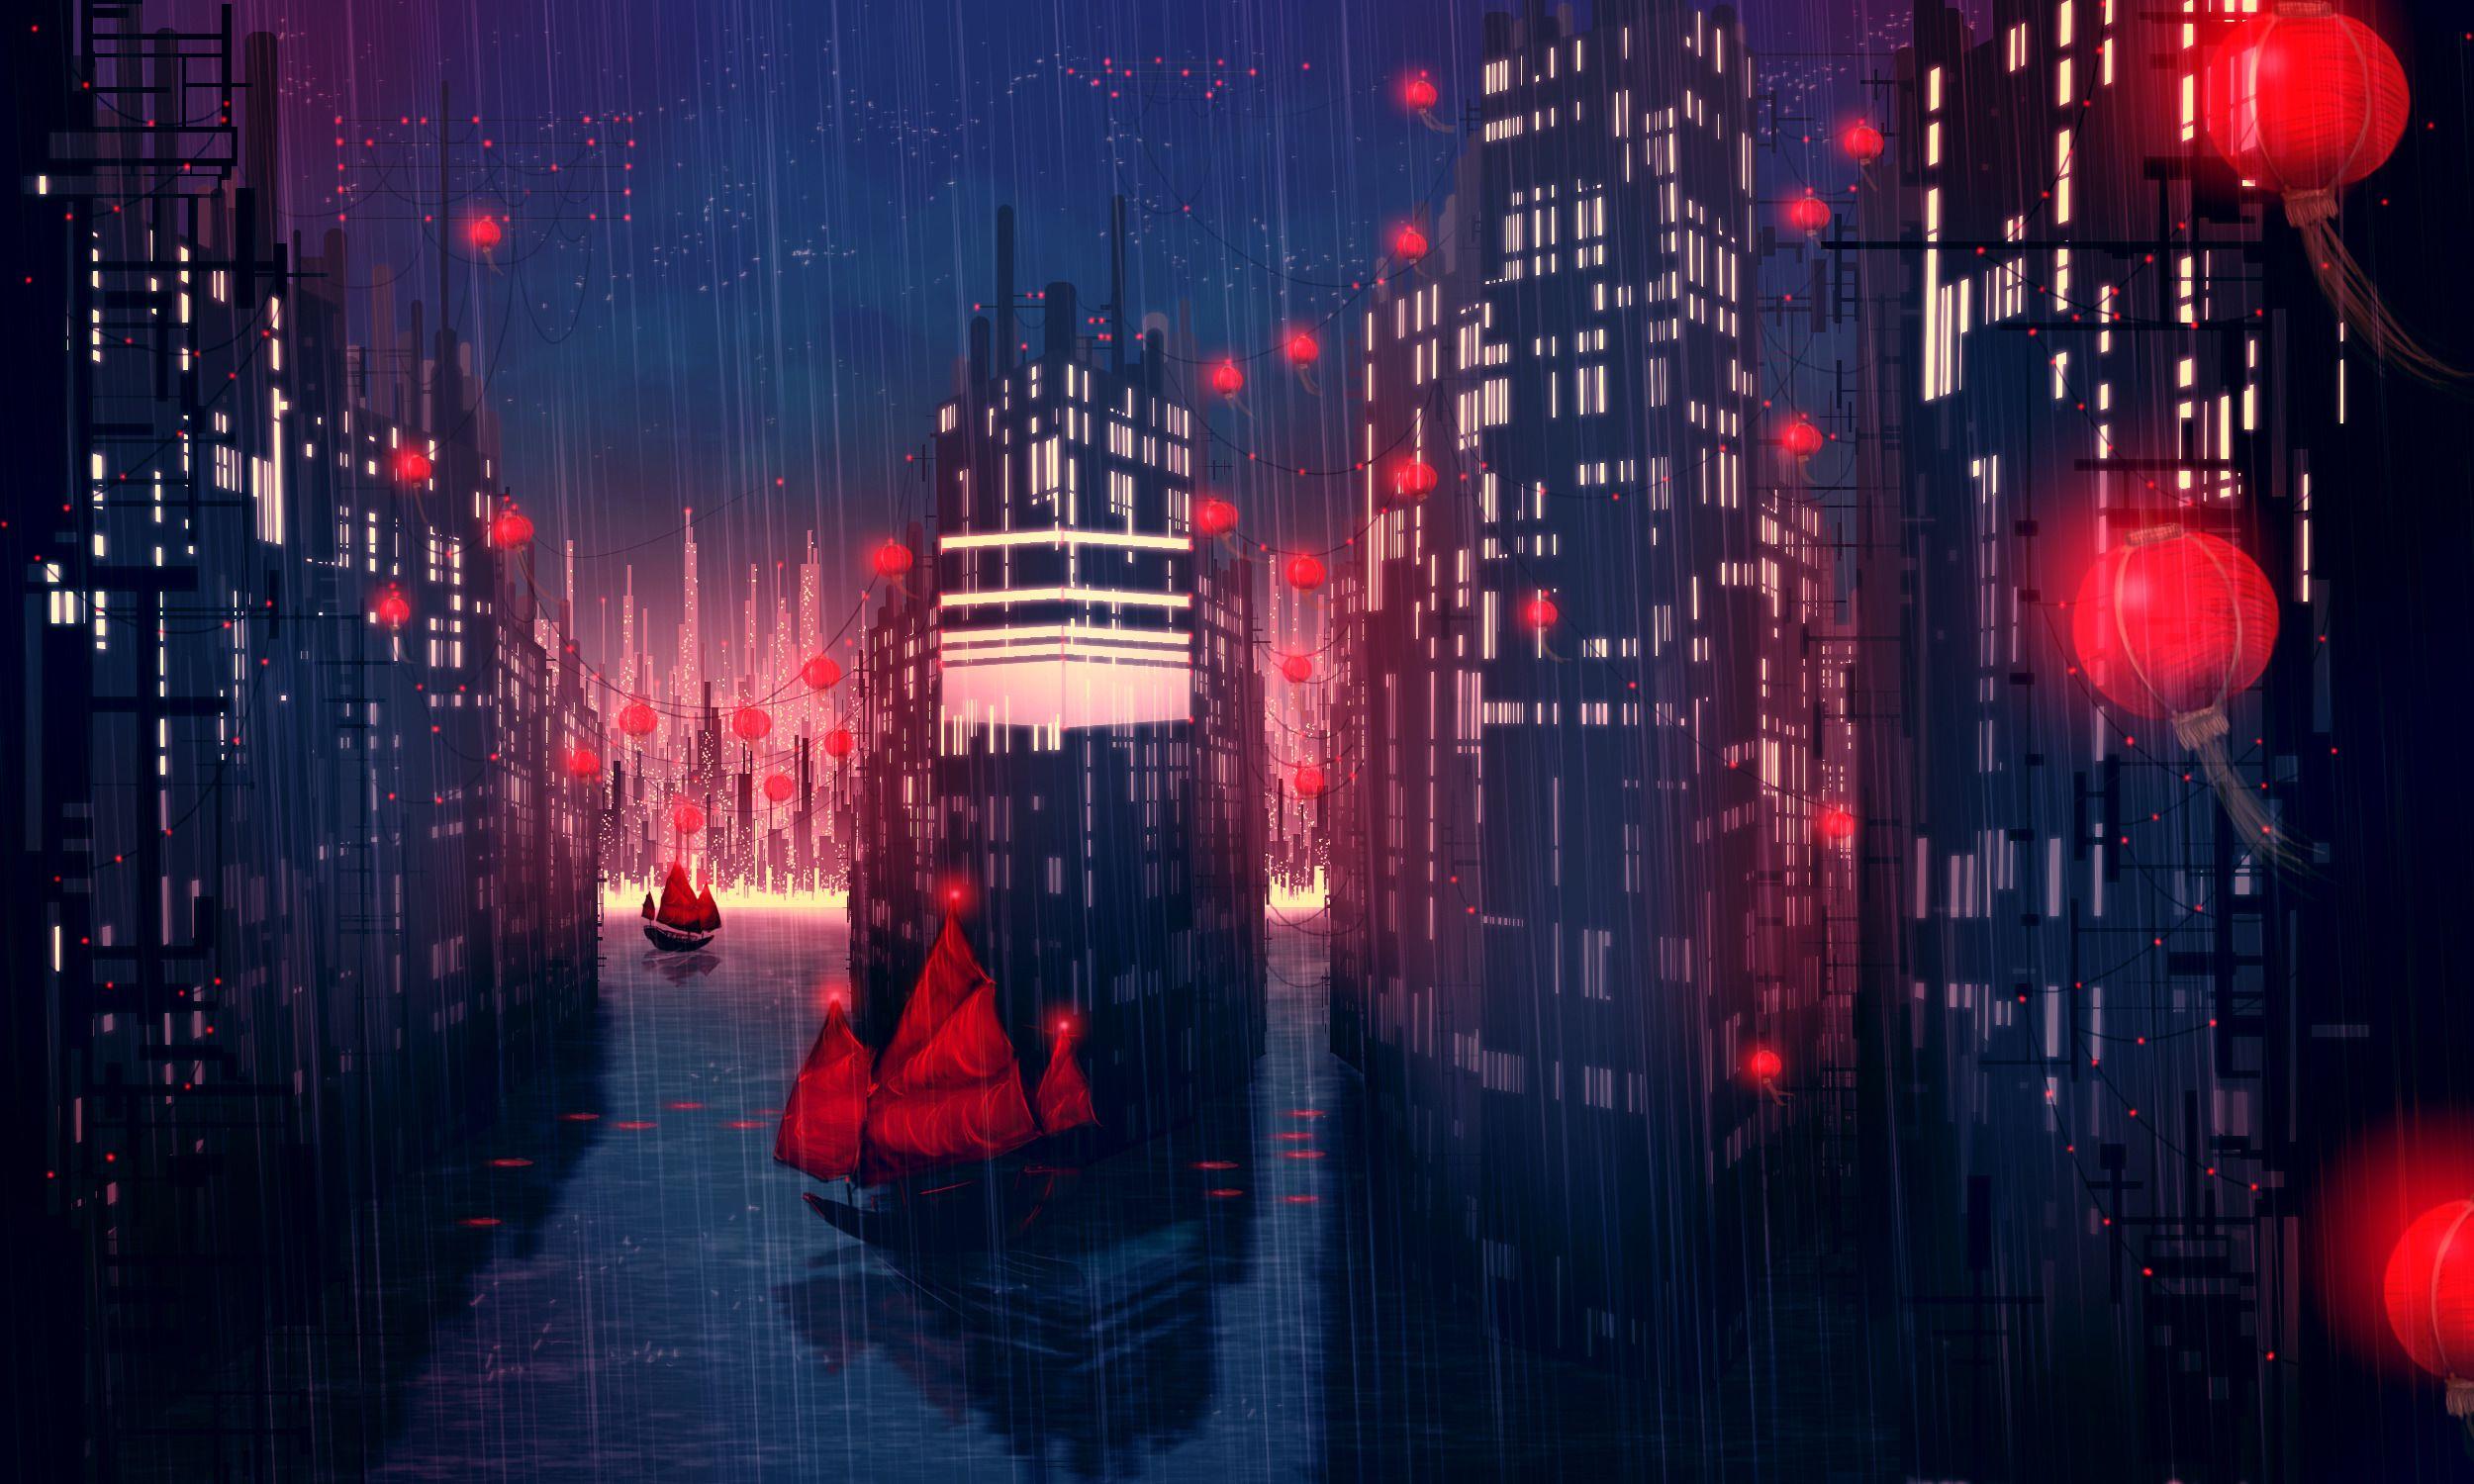 beautiful rain wallpapers hd